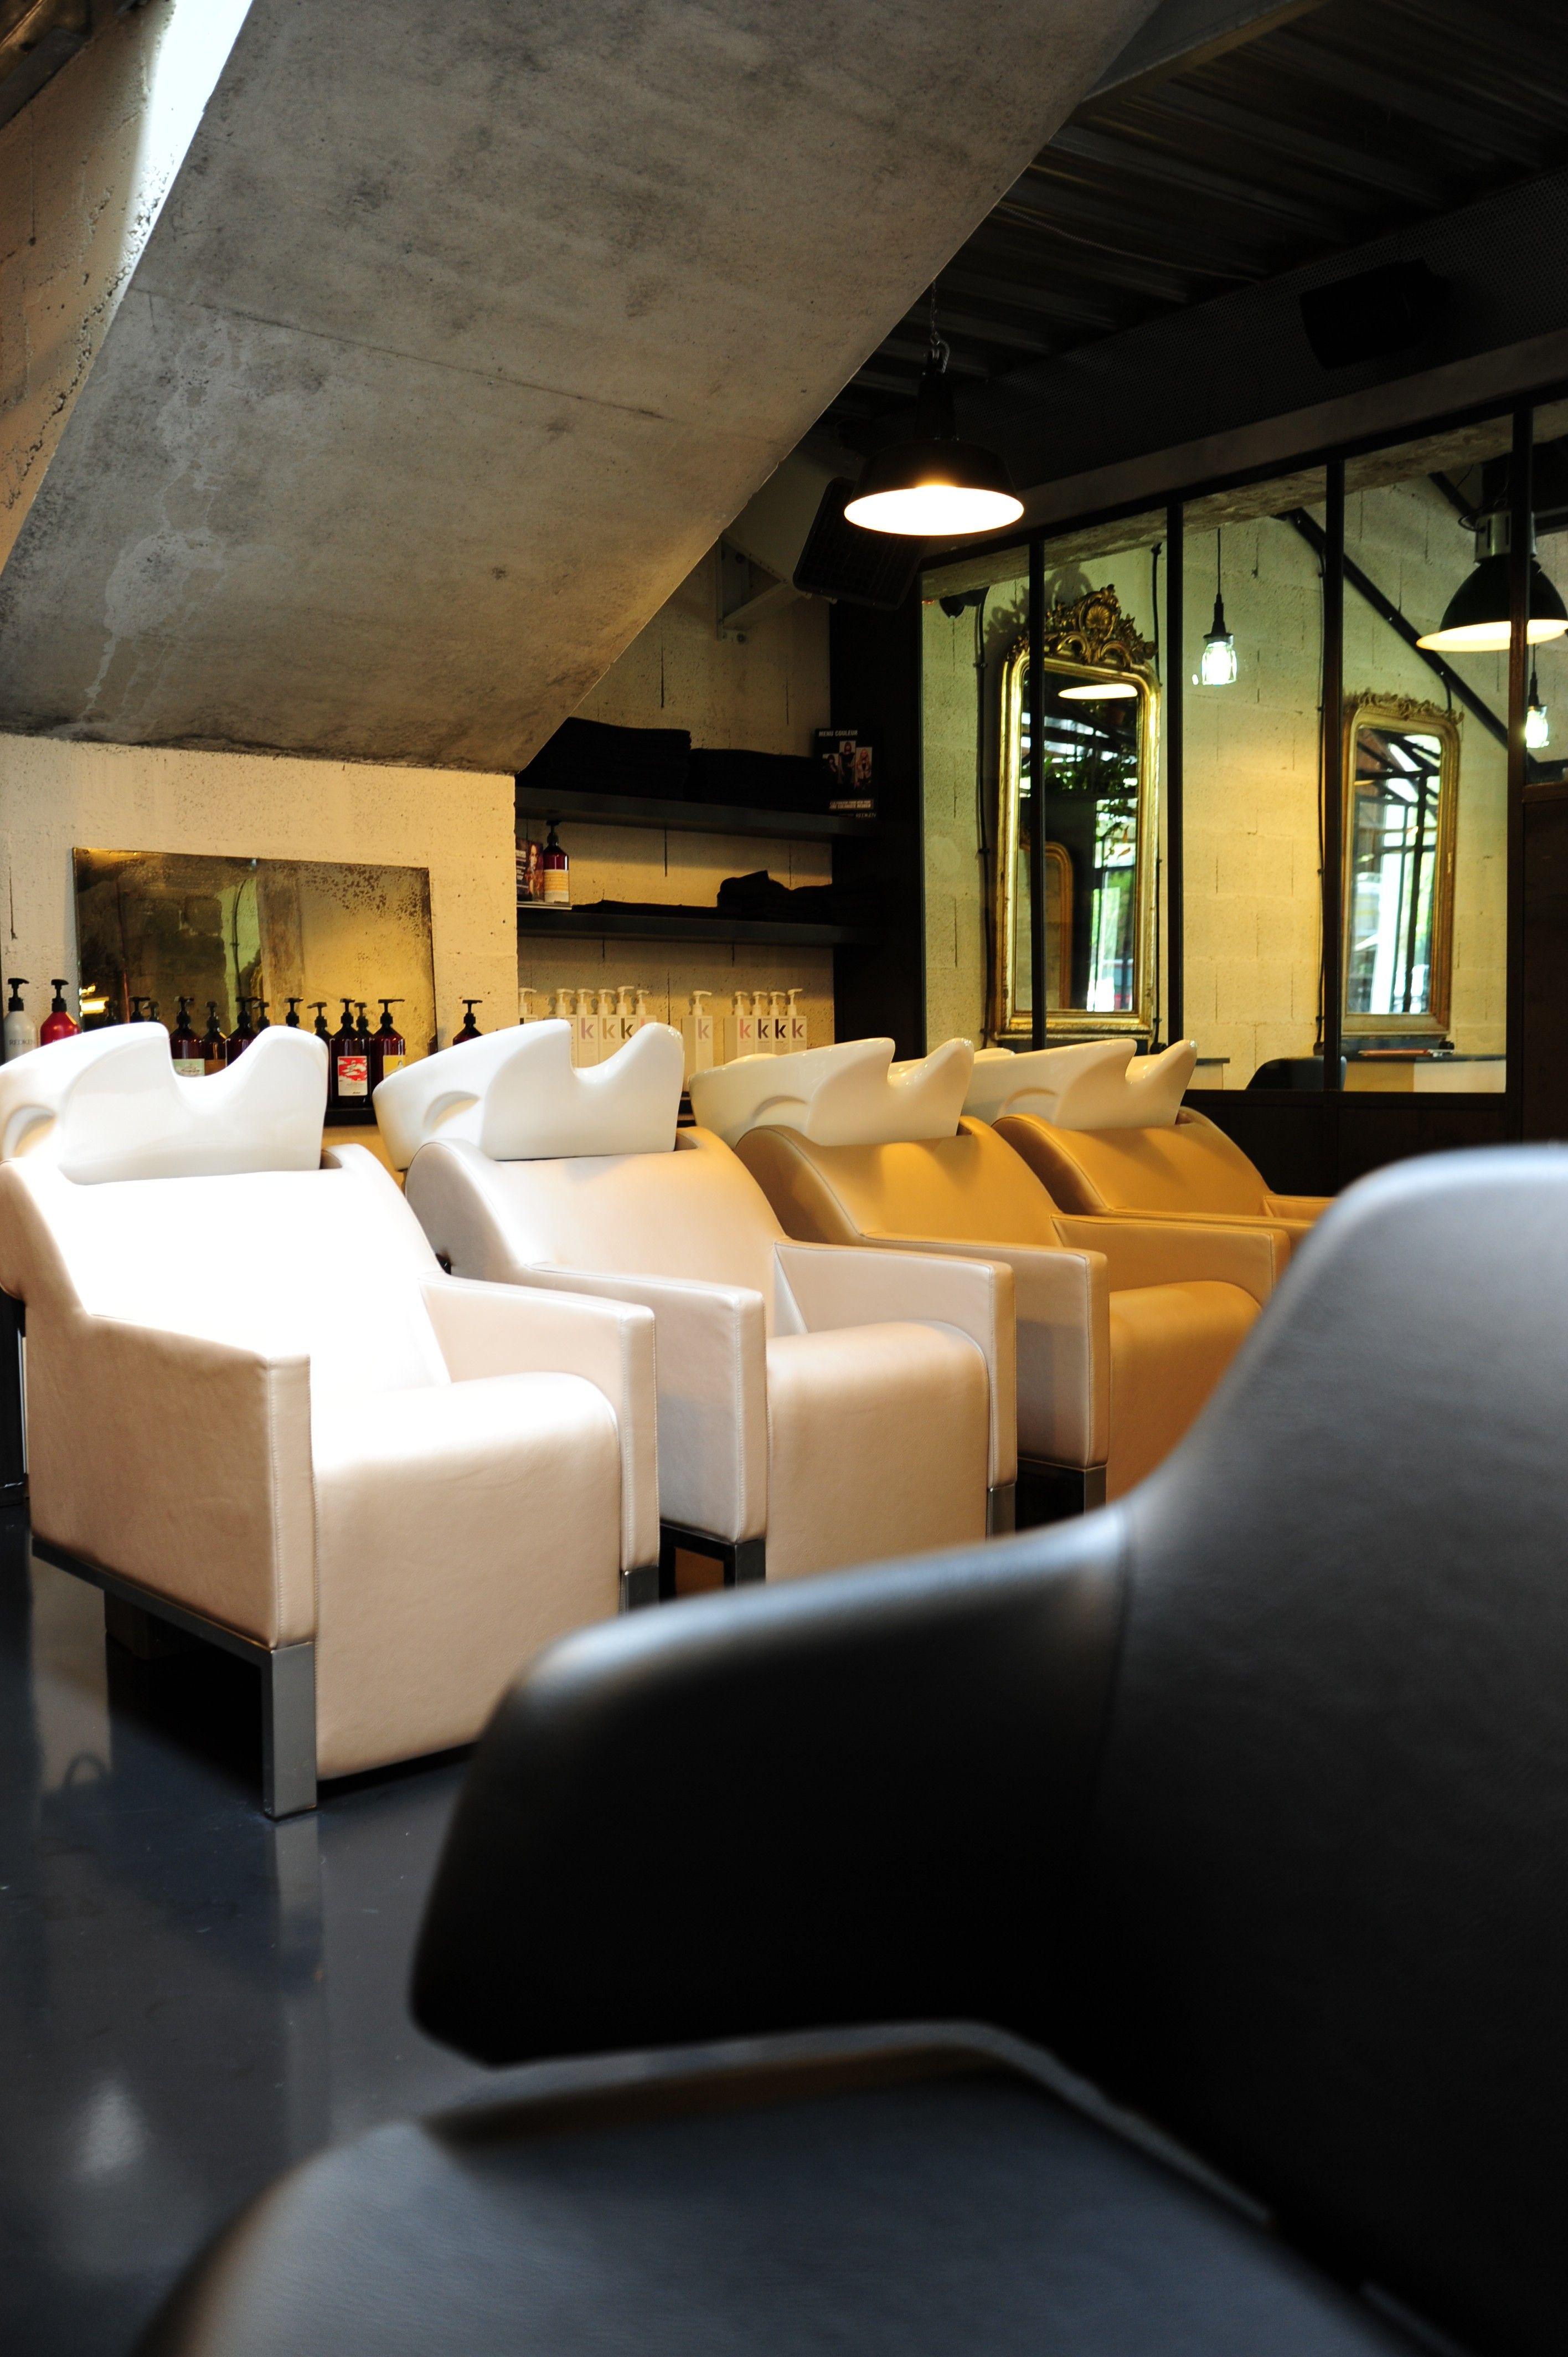 Salon De Coiffure La Serre Brest